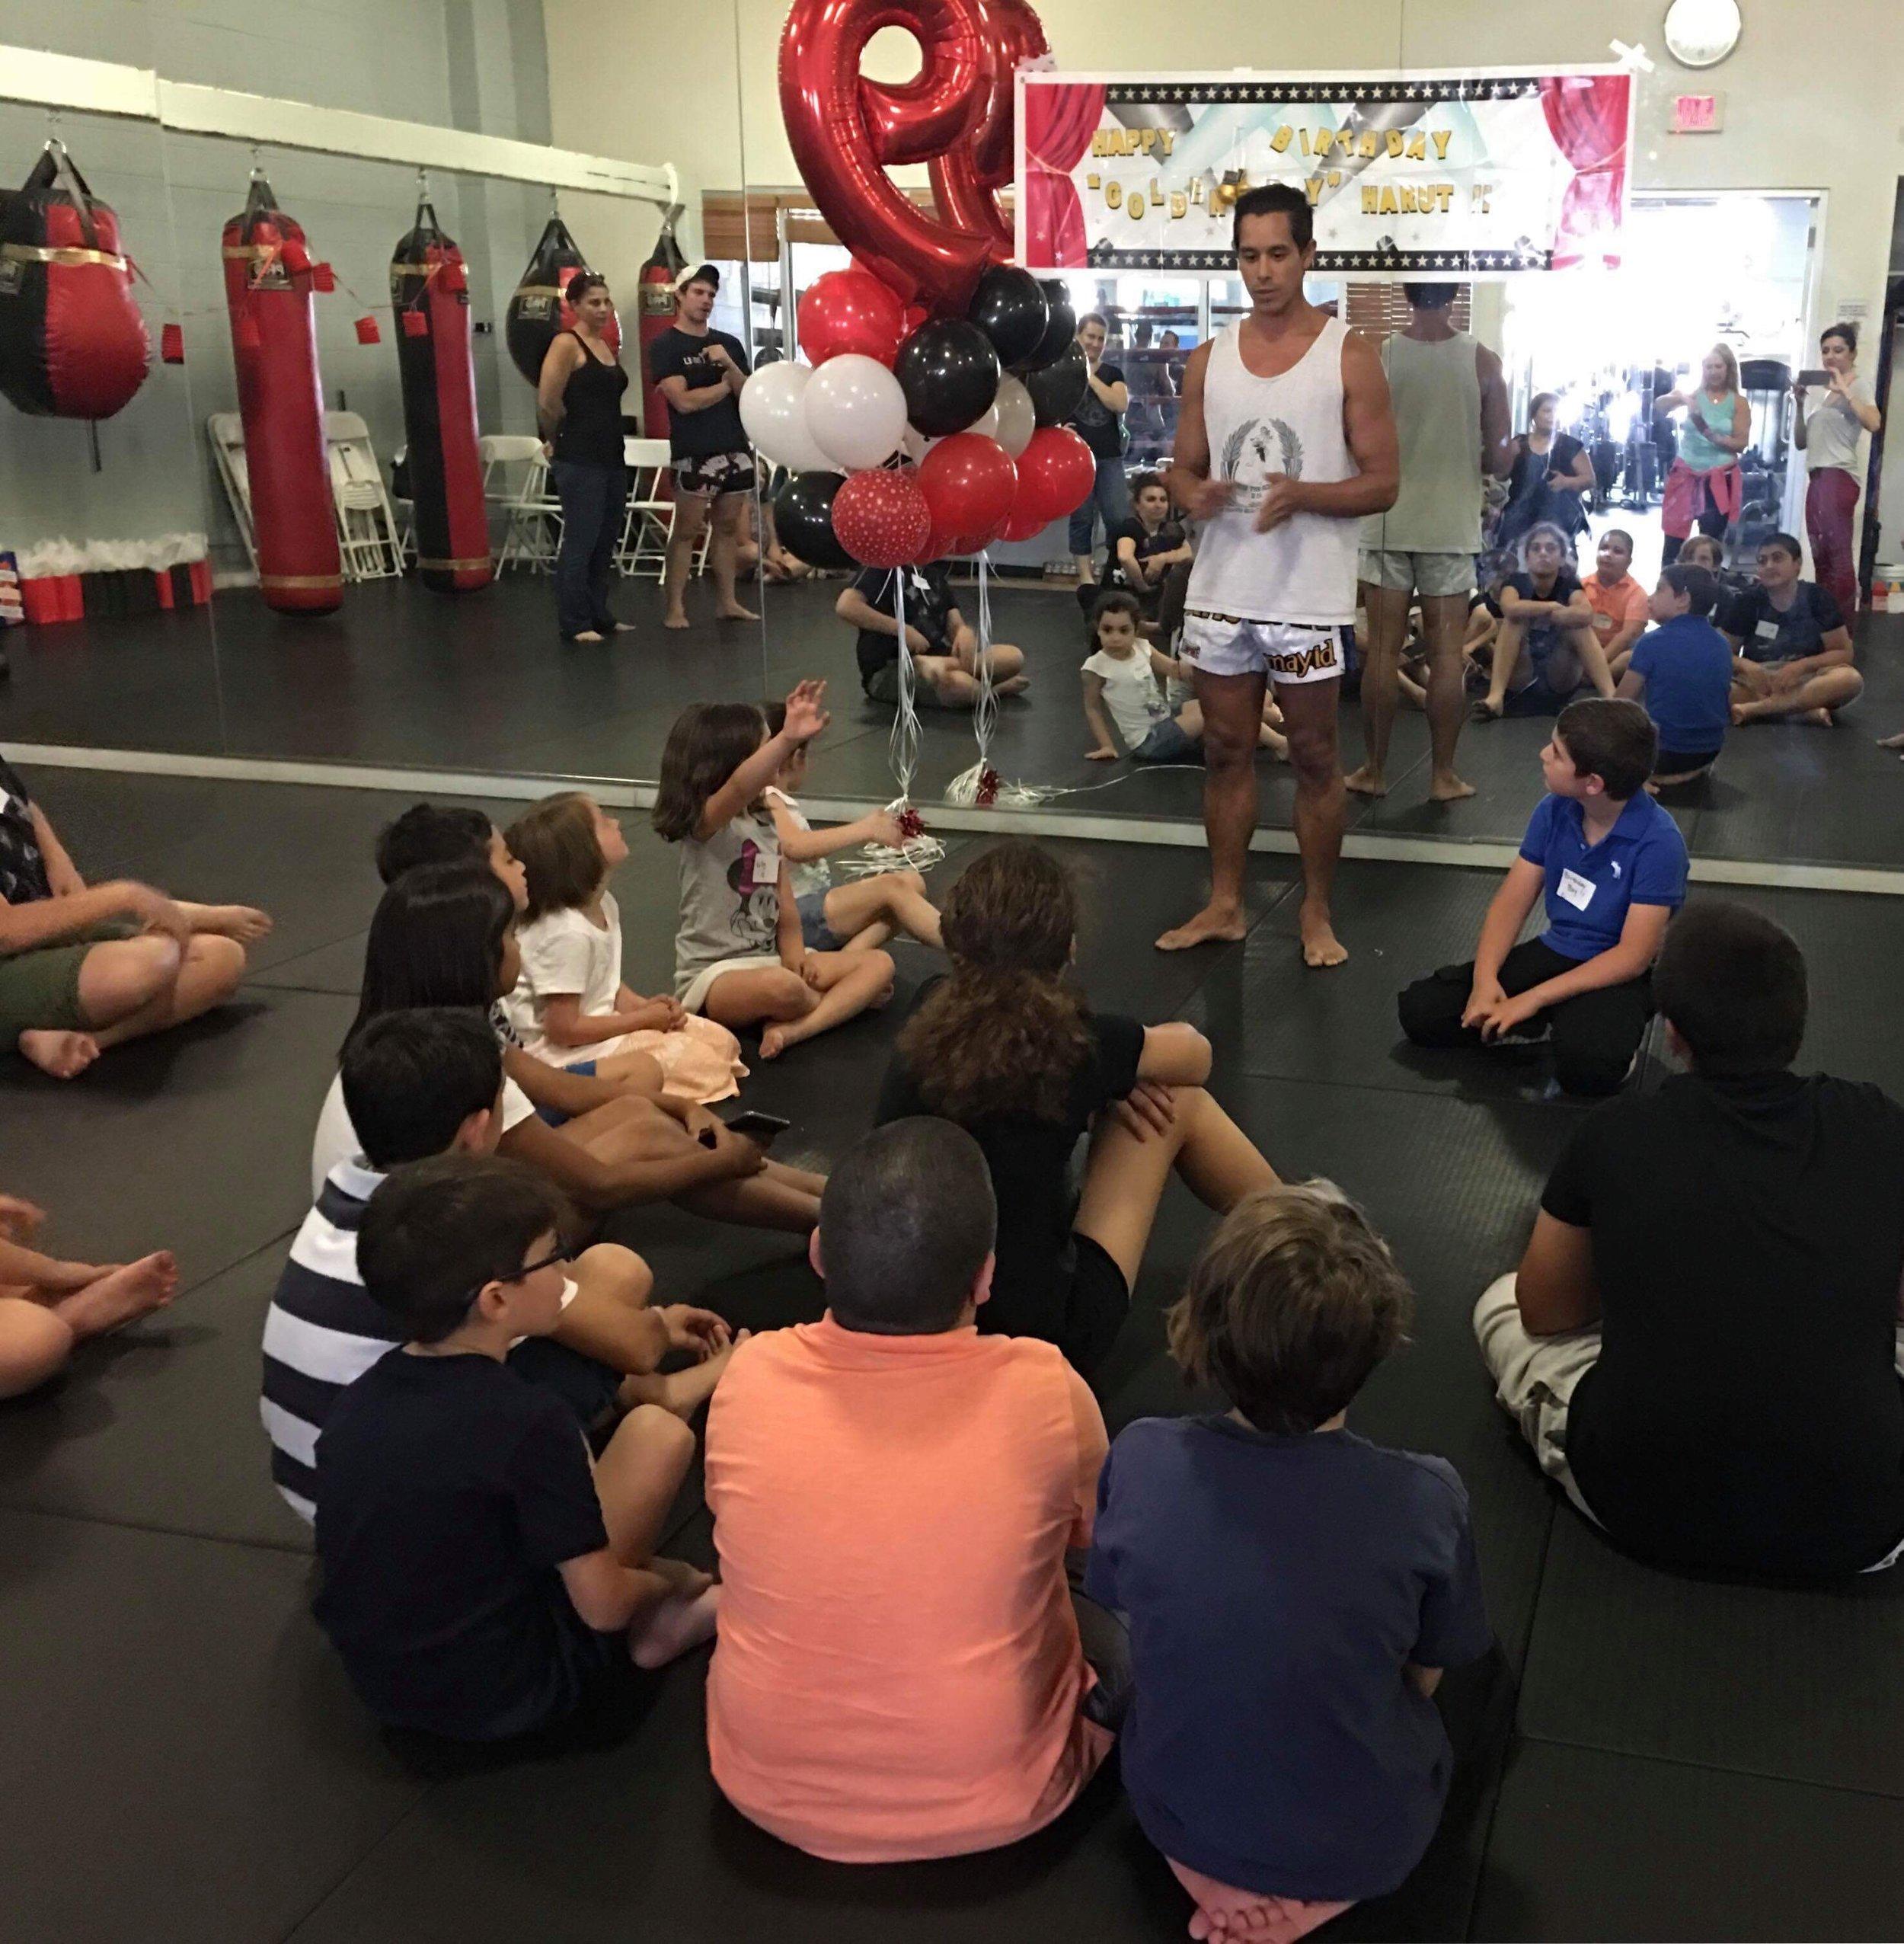 CELEBRATING A 9TH BIRTHDAY PARTY, MUAY THAI SCHOOL USA STYLE!